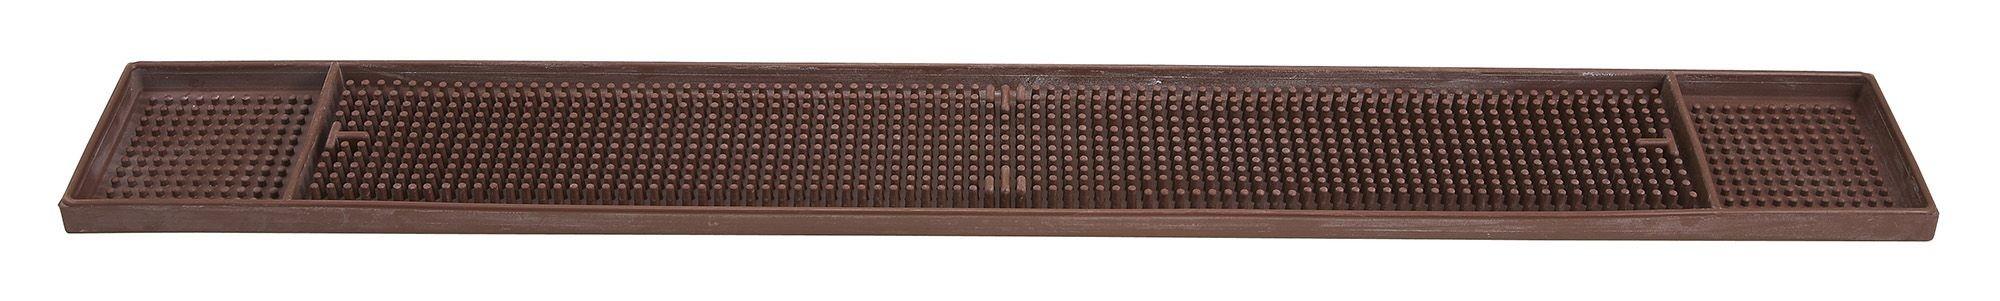 "Winco BM-327B Brown Rubber Bar Mat 27"" x 3-1/4"""